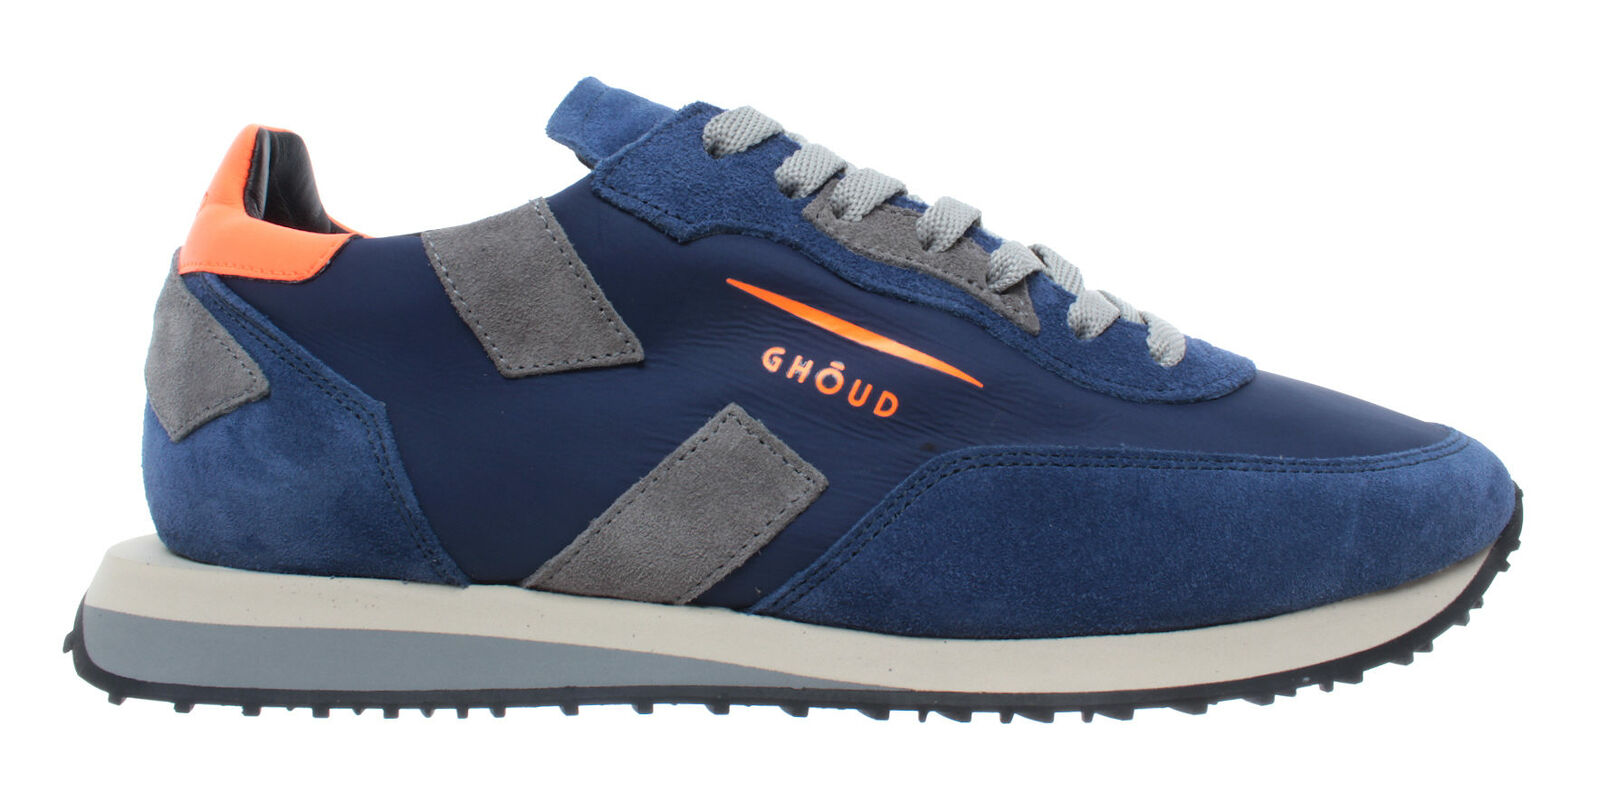 Chaussures hommes Turnchaussures GHOUD Venice Rush Man bleu Orange Fluo bleu Nouveau